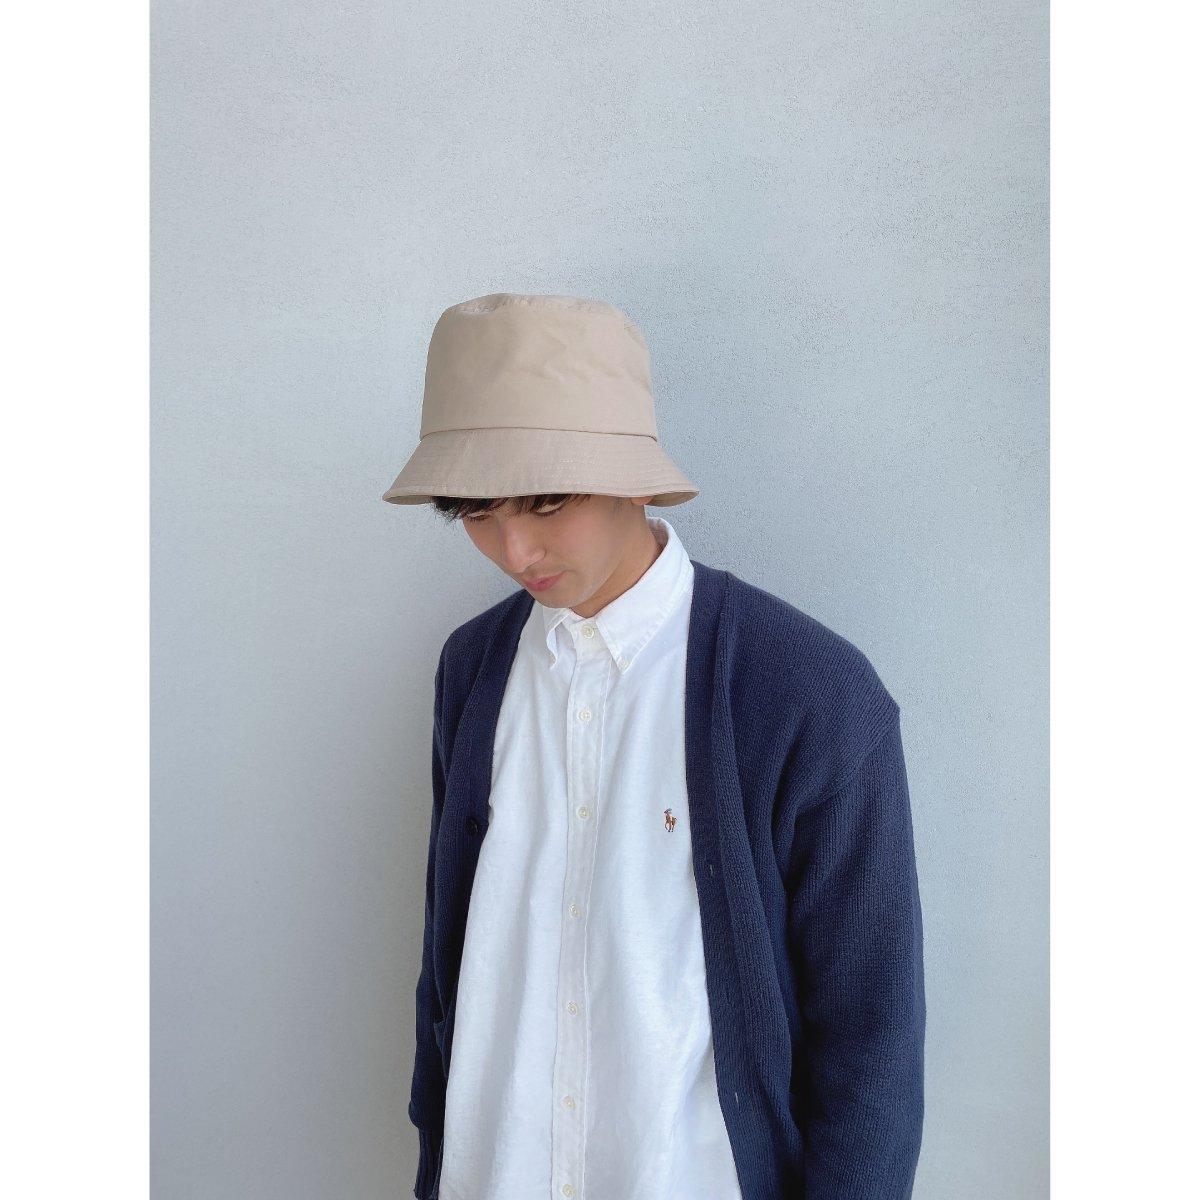 Genius BK Hat 詳細画像18